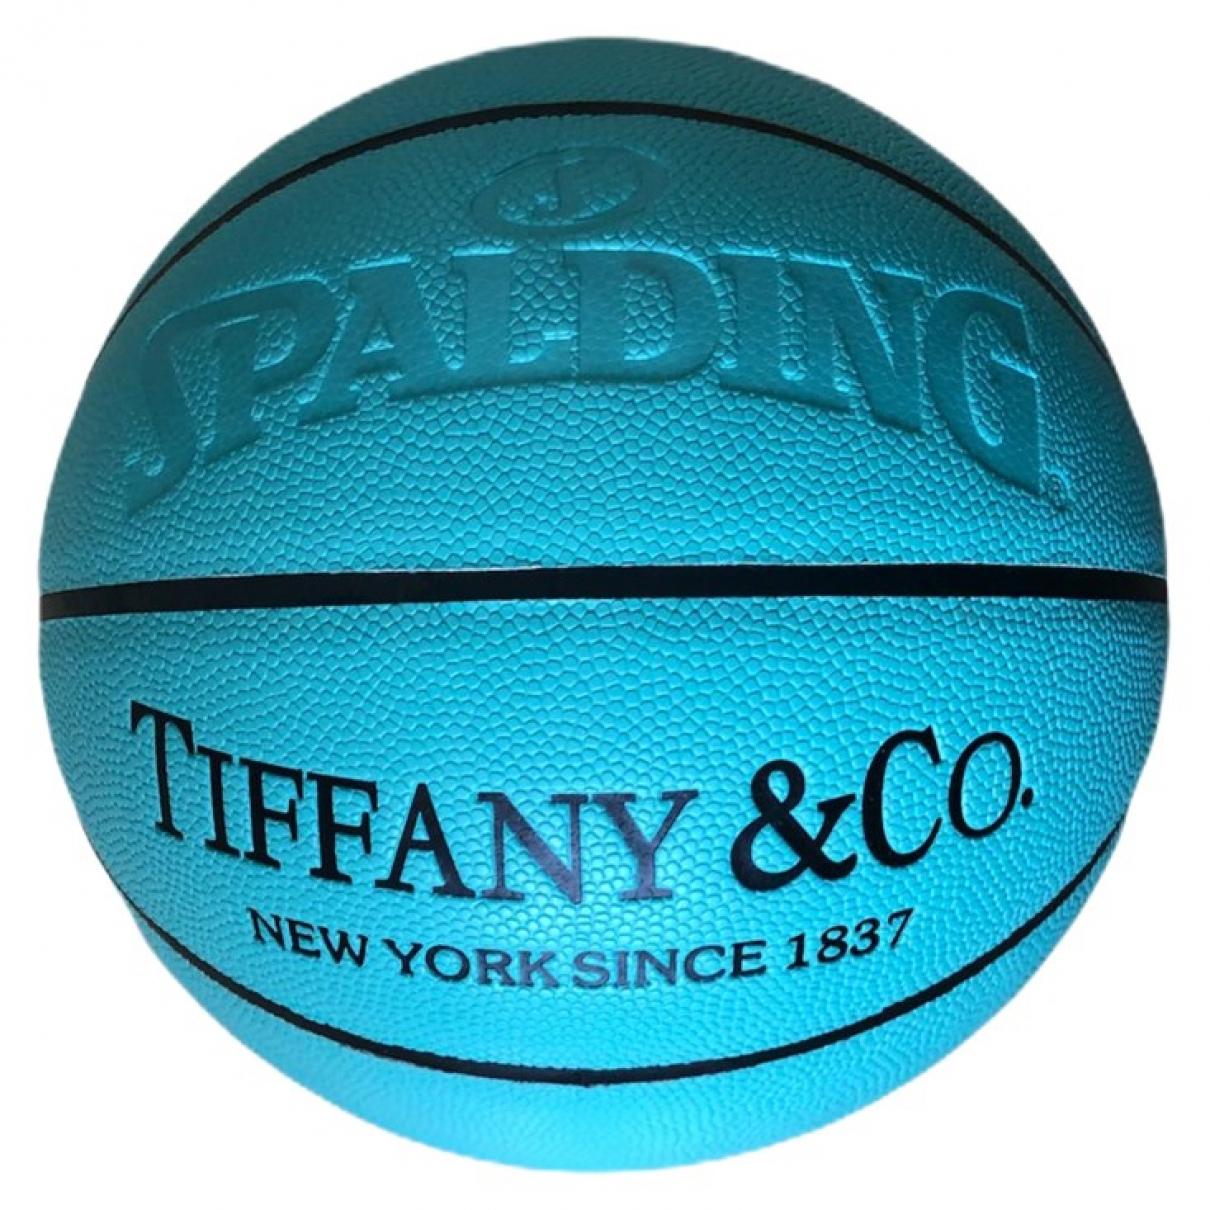 Tiffany & Co - Ballons   pour lifestyle en cuir - bleu